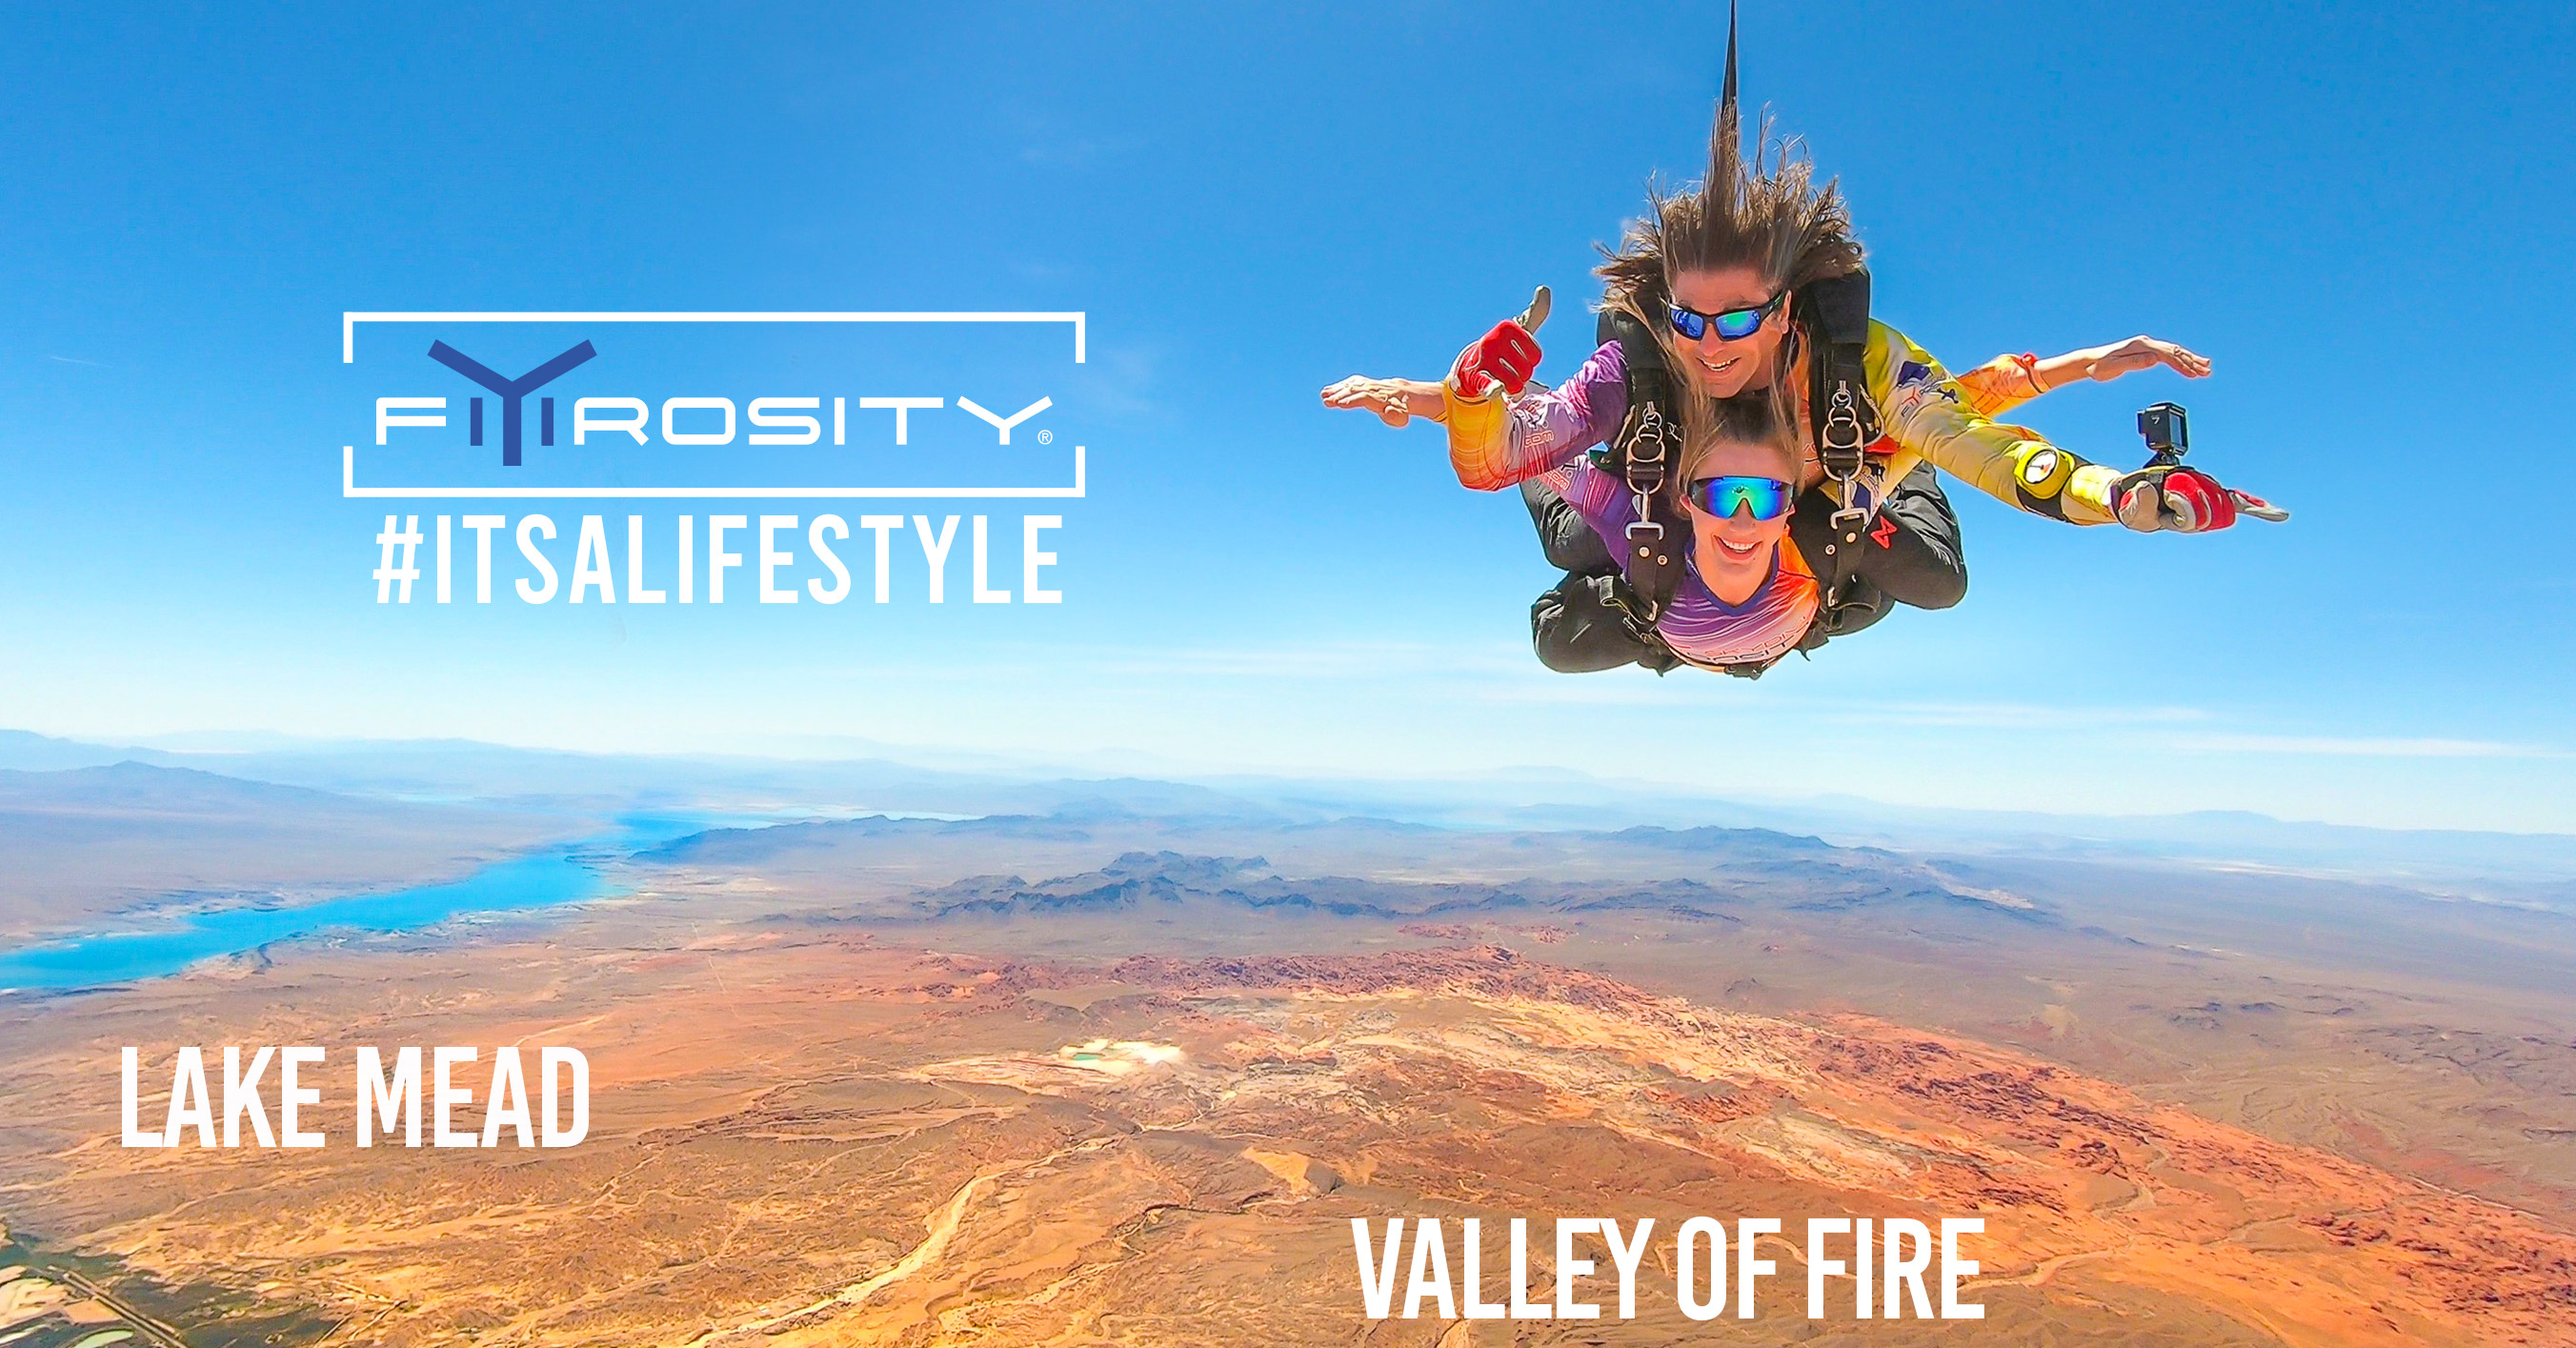 Skydive Fyrosity #itsalifestyle